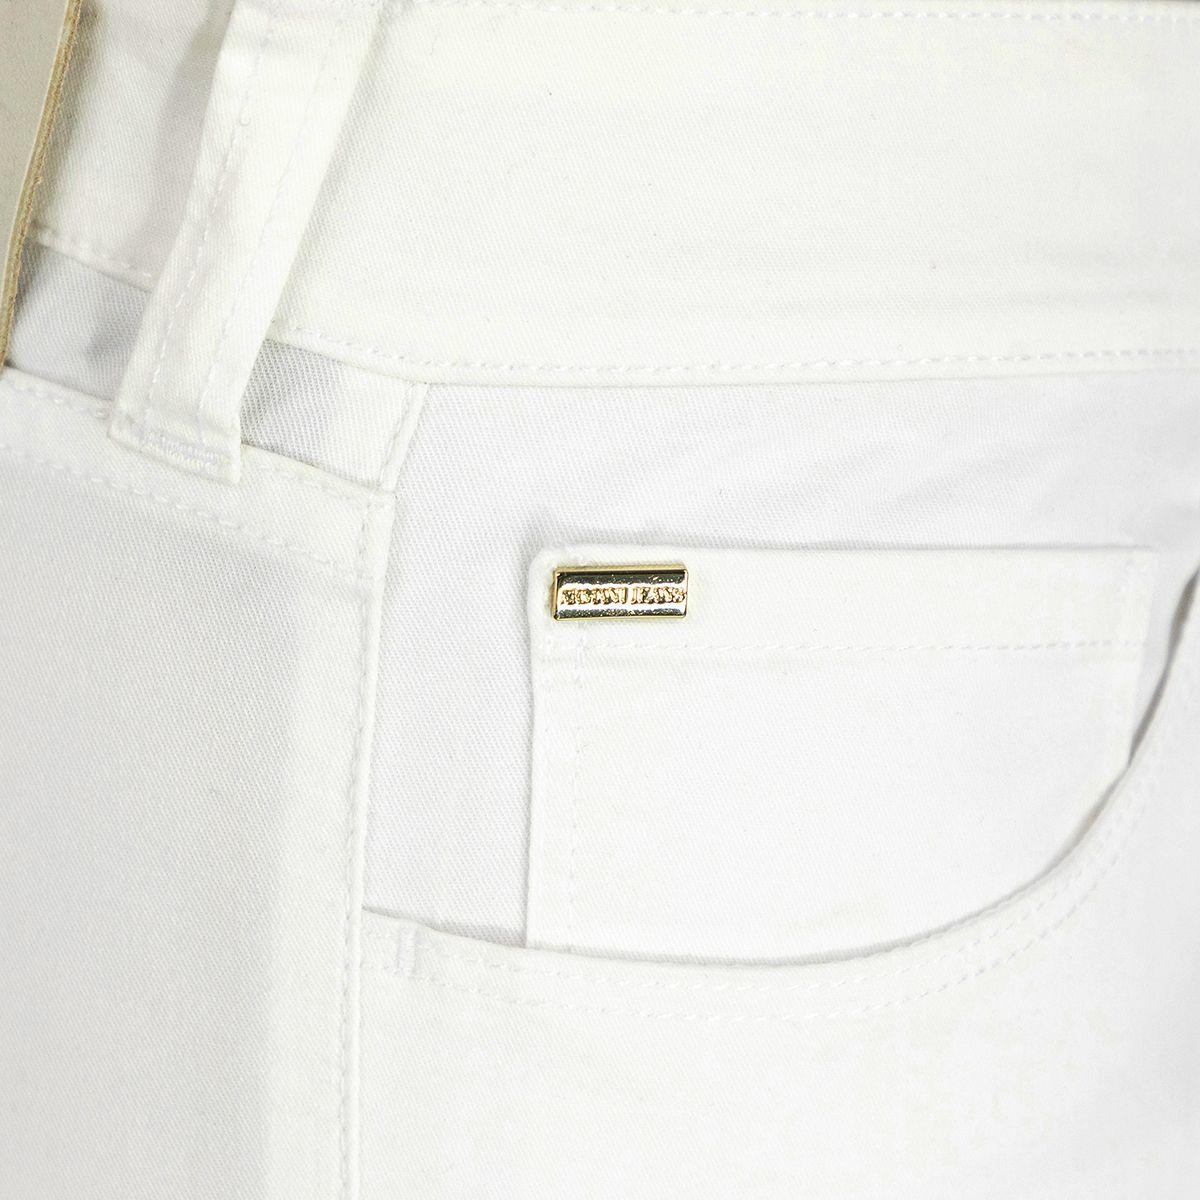 Armani Jeans 5 pockets Pants